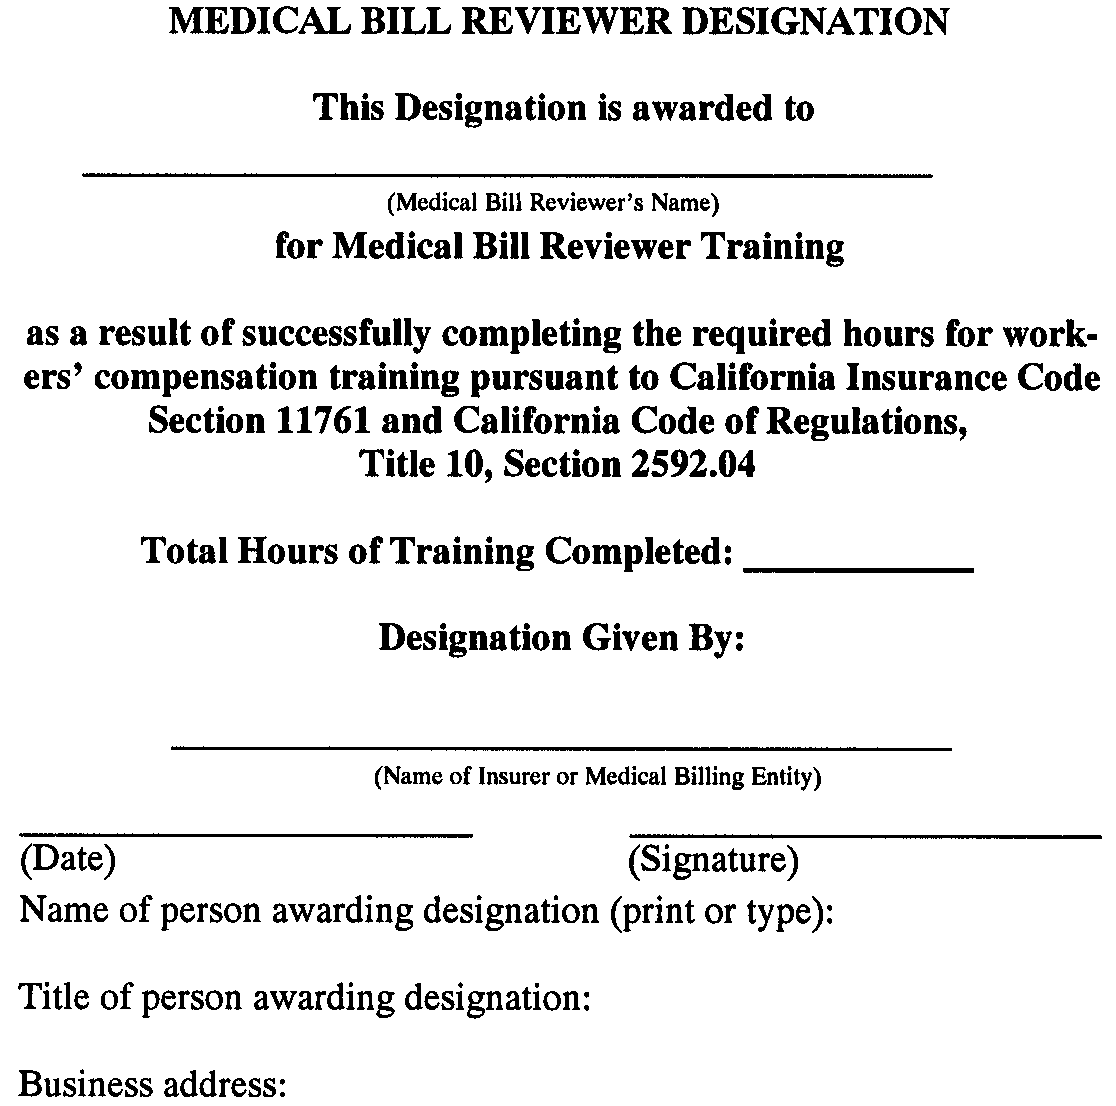 § 2592.11. Designation -Medical Bill Reviewer., Article 20 ...